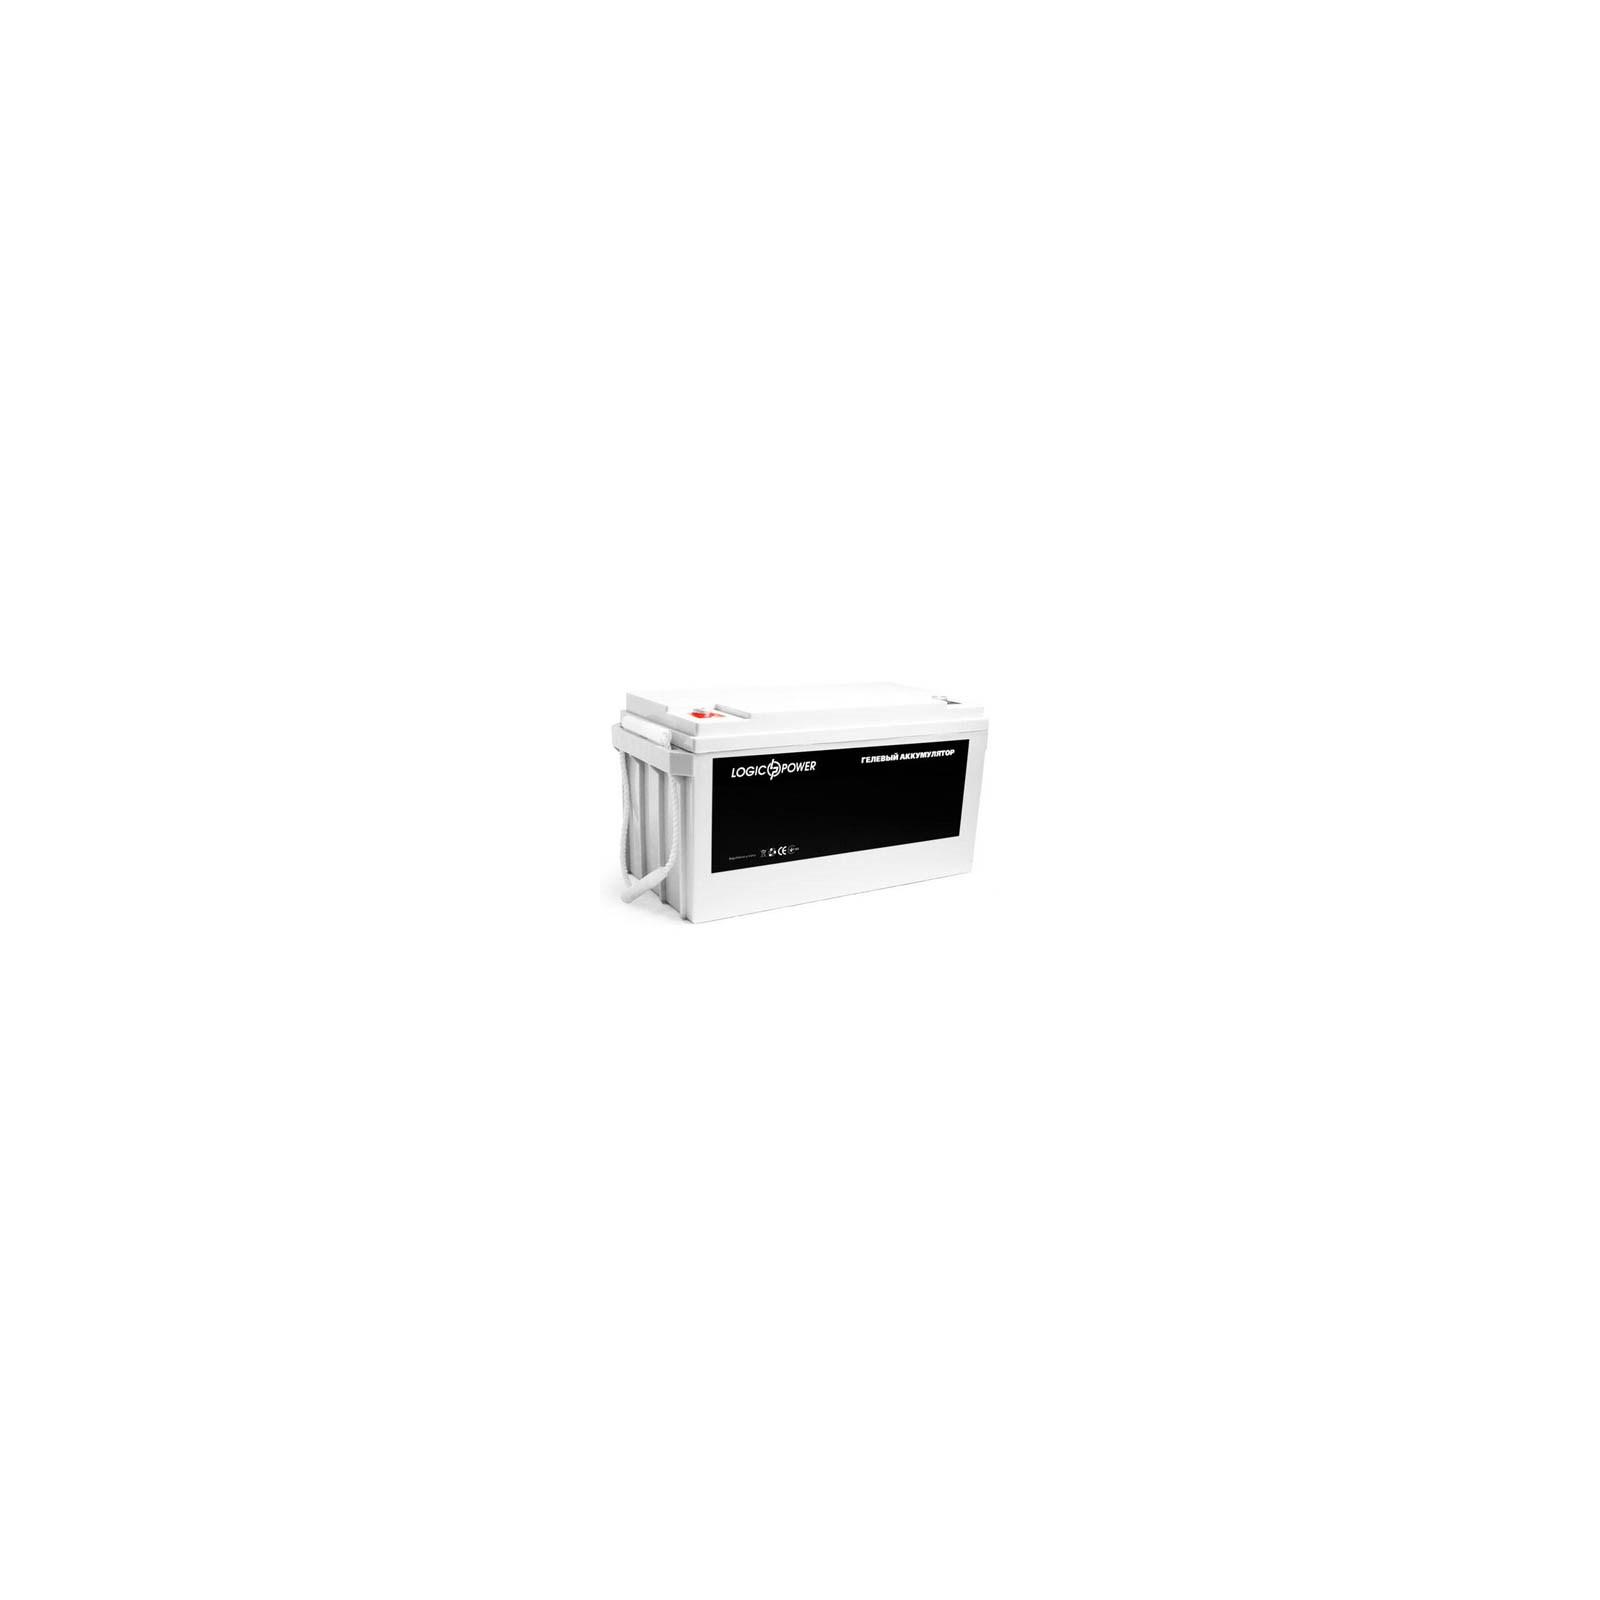 Батарея к ИБП LogicPower MG 12В 120Ач (2316)